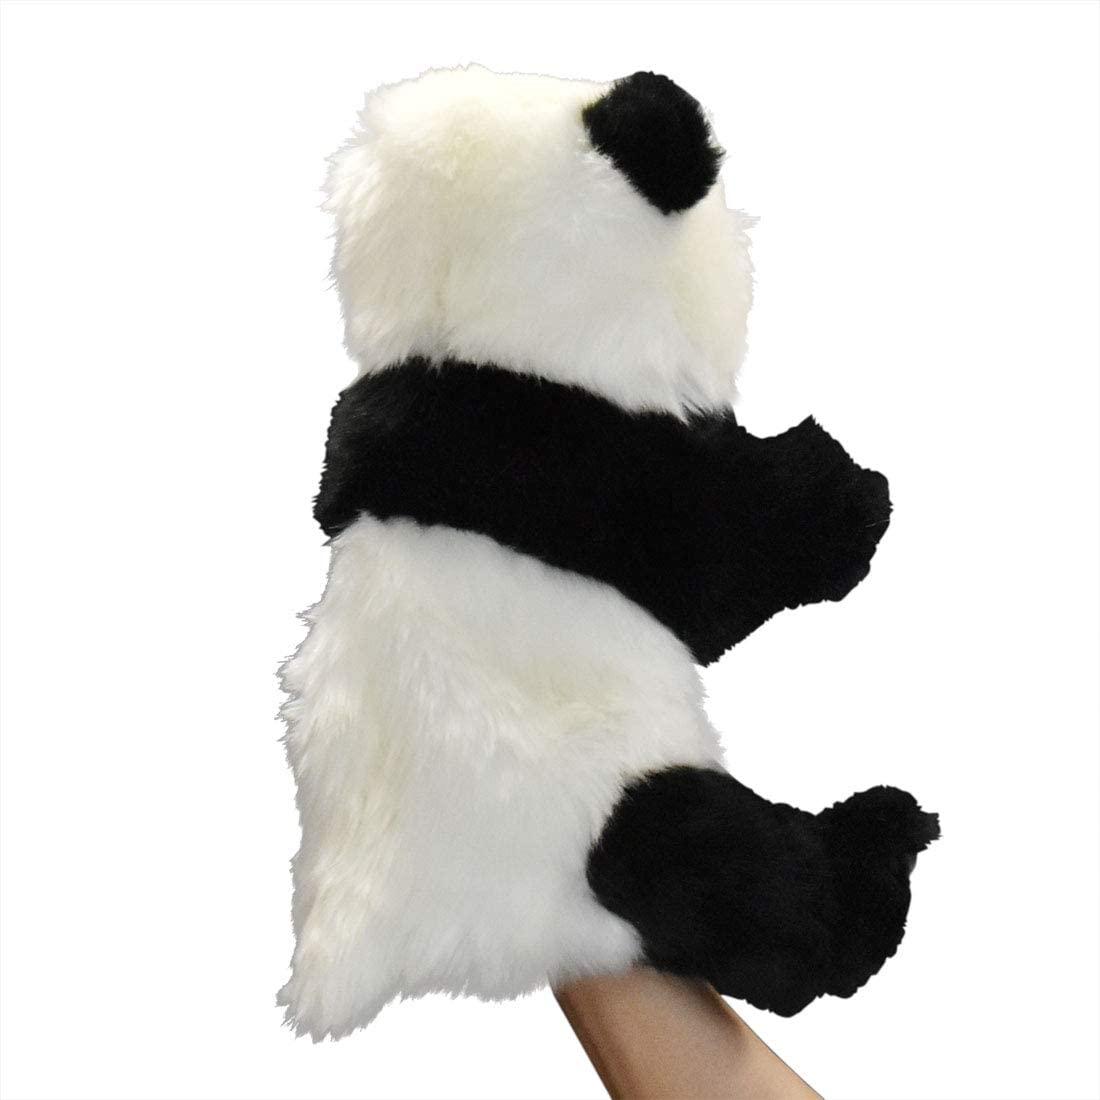 Handpuppe Panda originalgetreu 30cm PandabärTheaterpuppe Hansa 7165 Seite Rechts